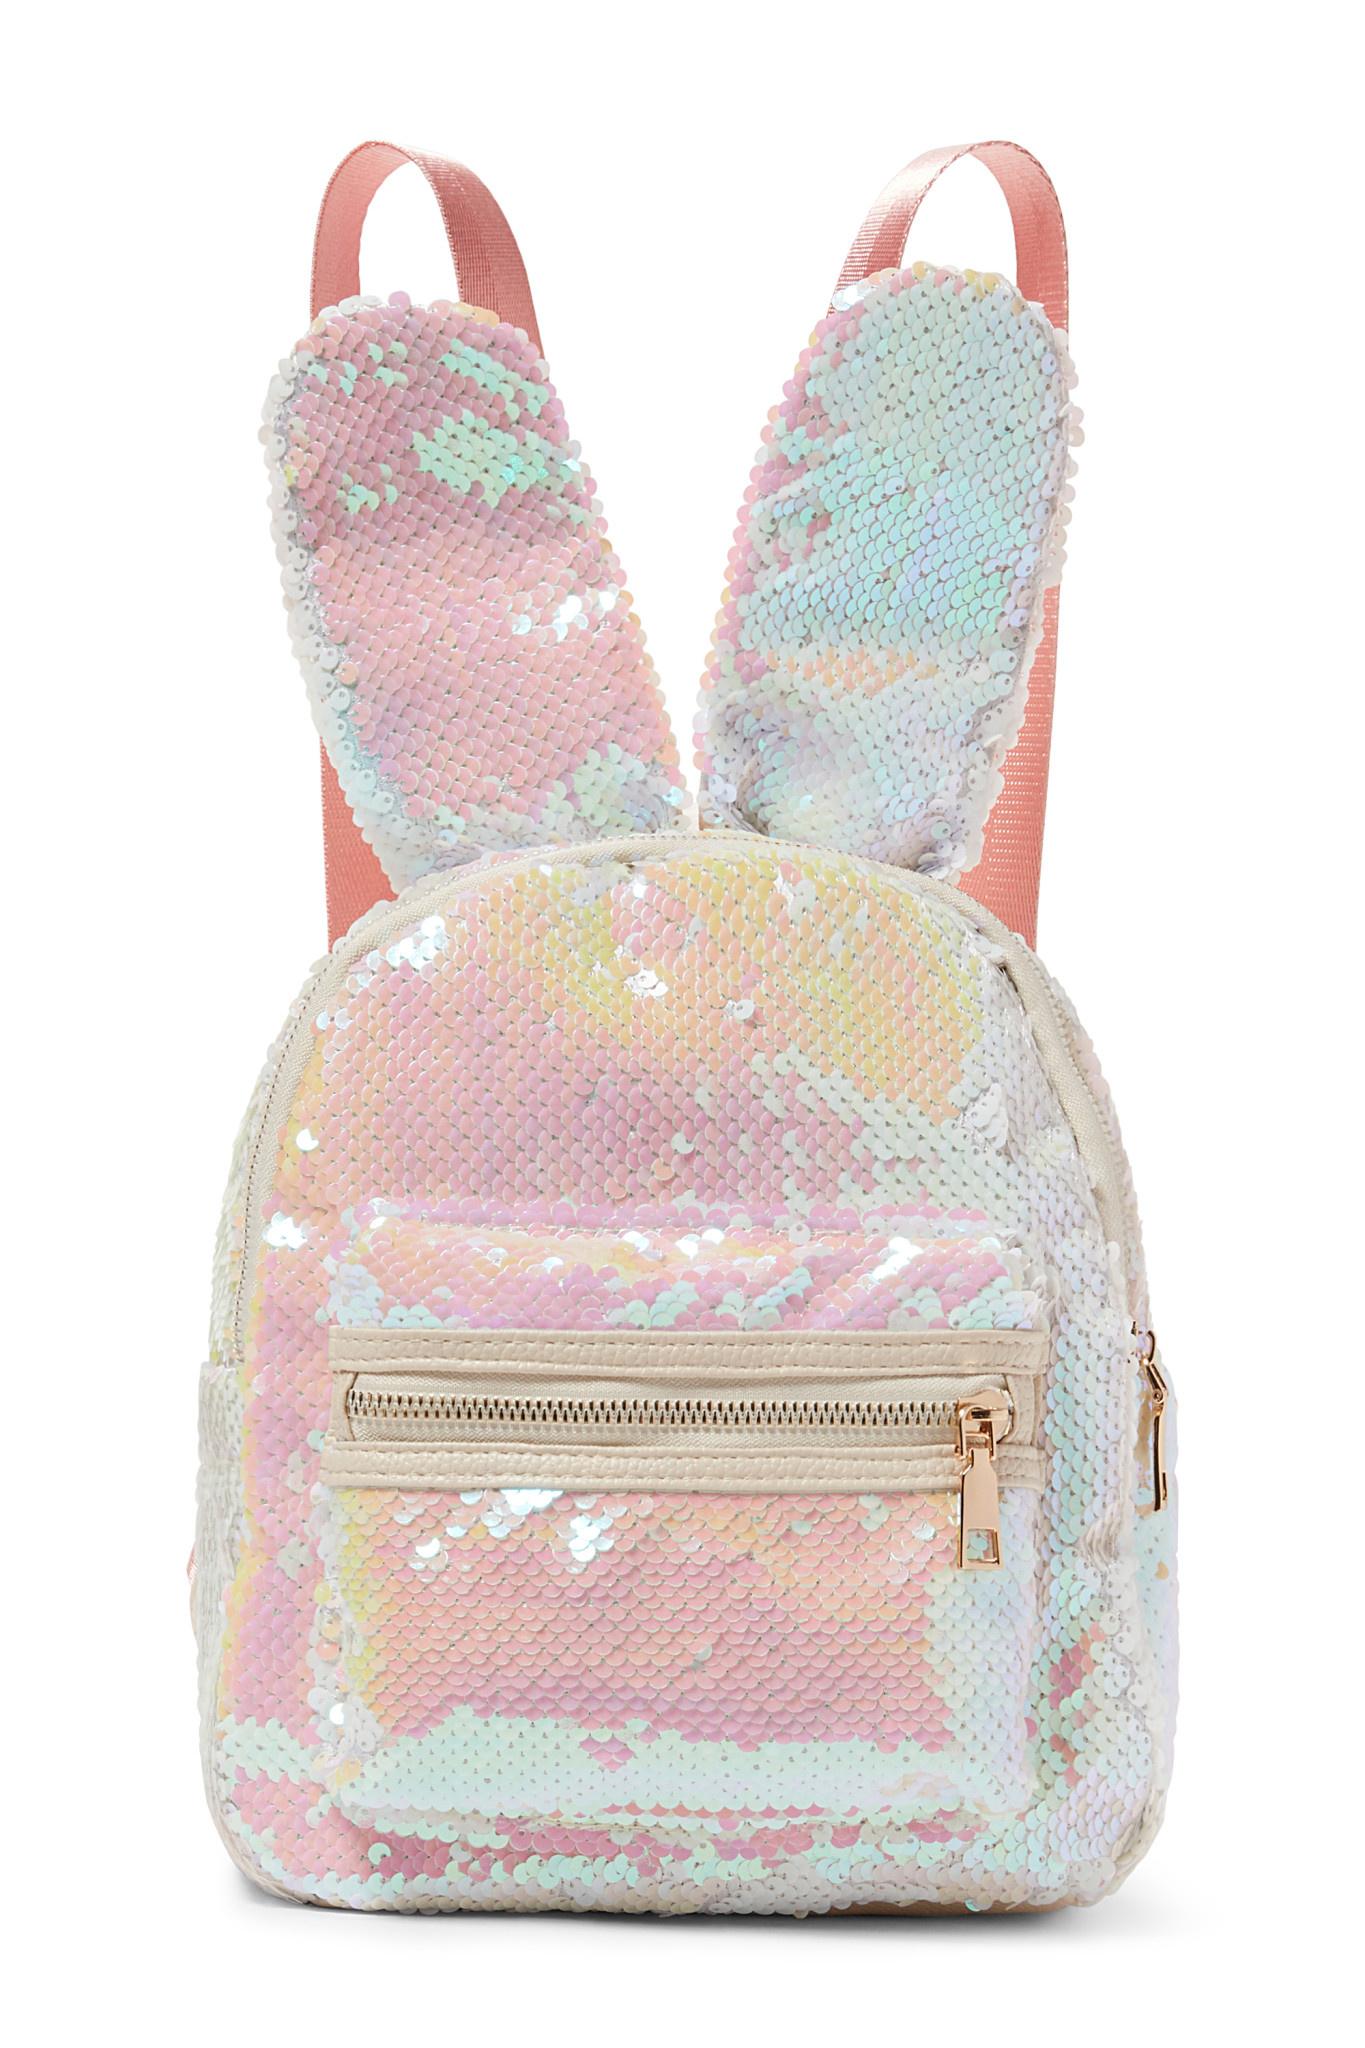 PLUM Bunnie Backpack